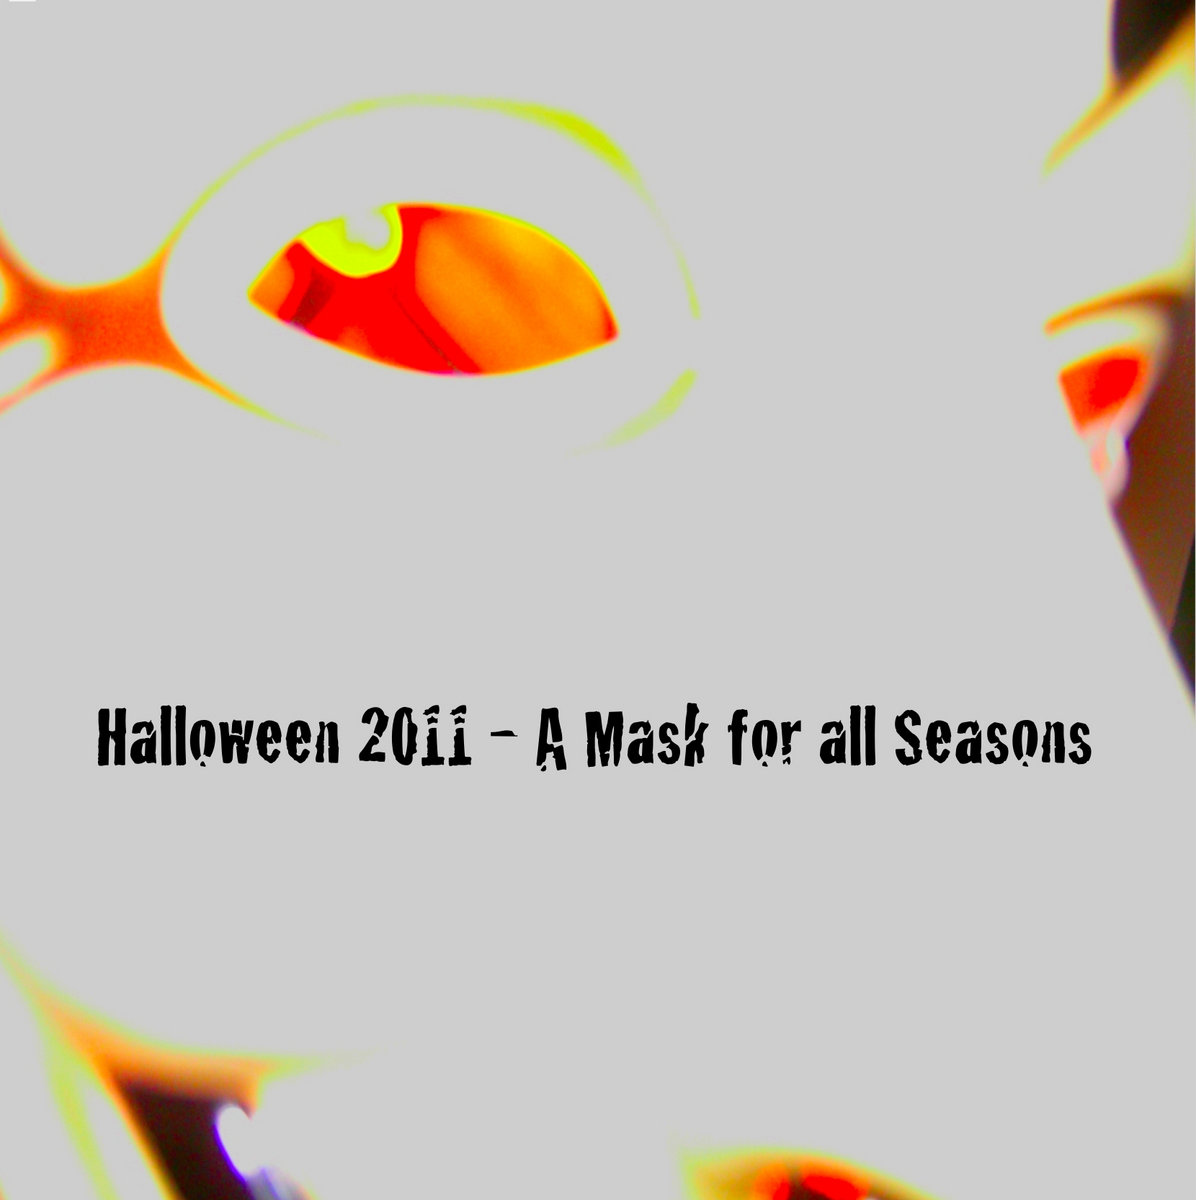 halloween 2011 - a mask for all seasons   mcsd netlabel